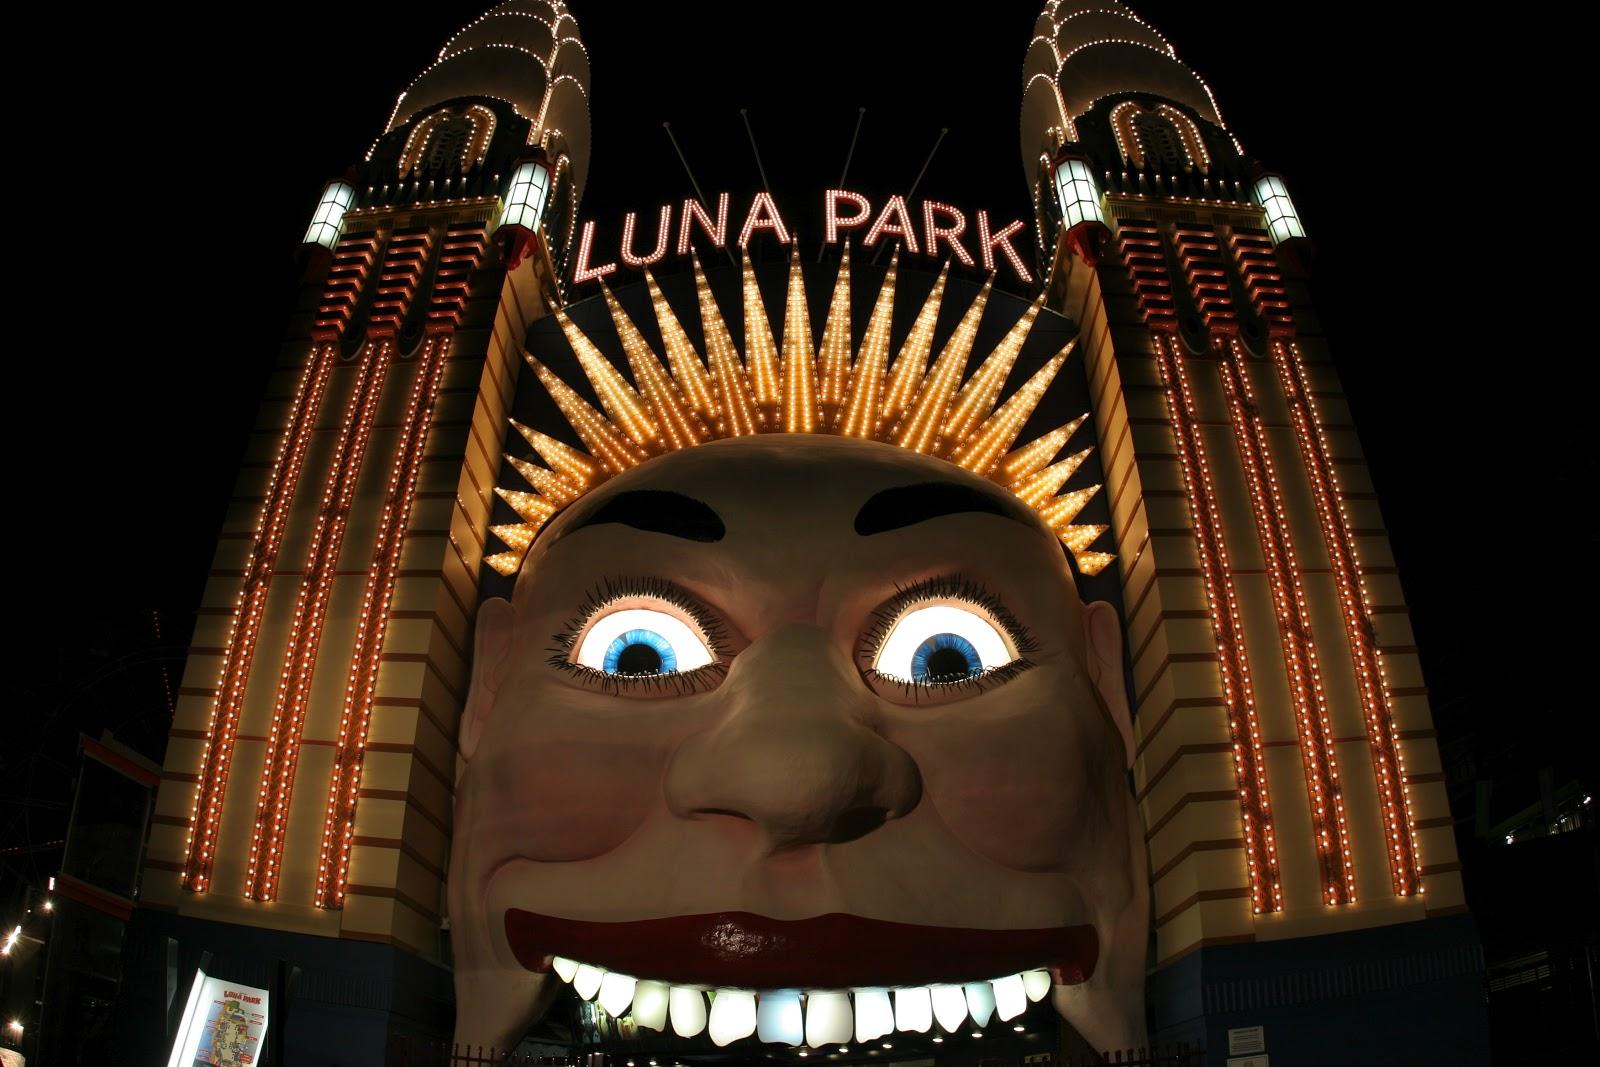 Just looking, thanks ...: Sydney's Luna Park: the ... | 1600 x 1067 jpeg 292kB